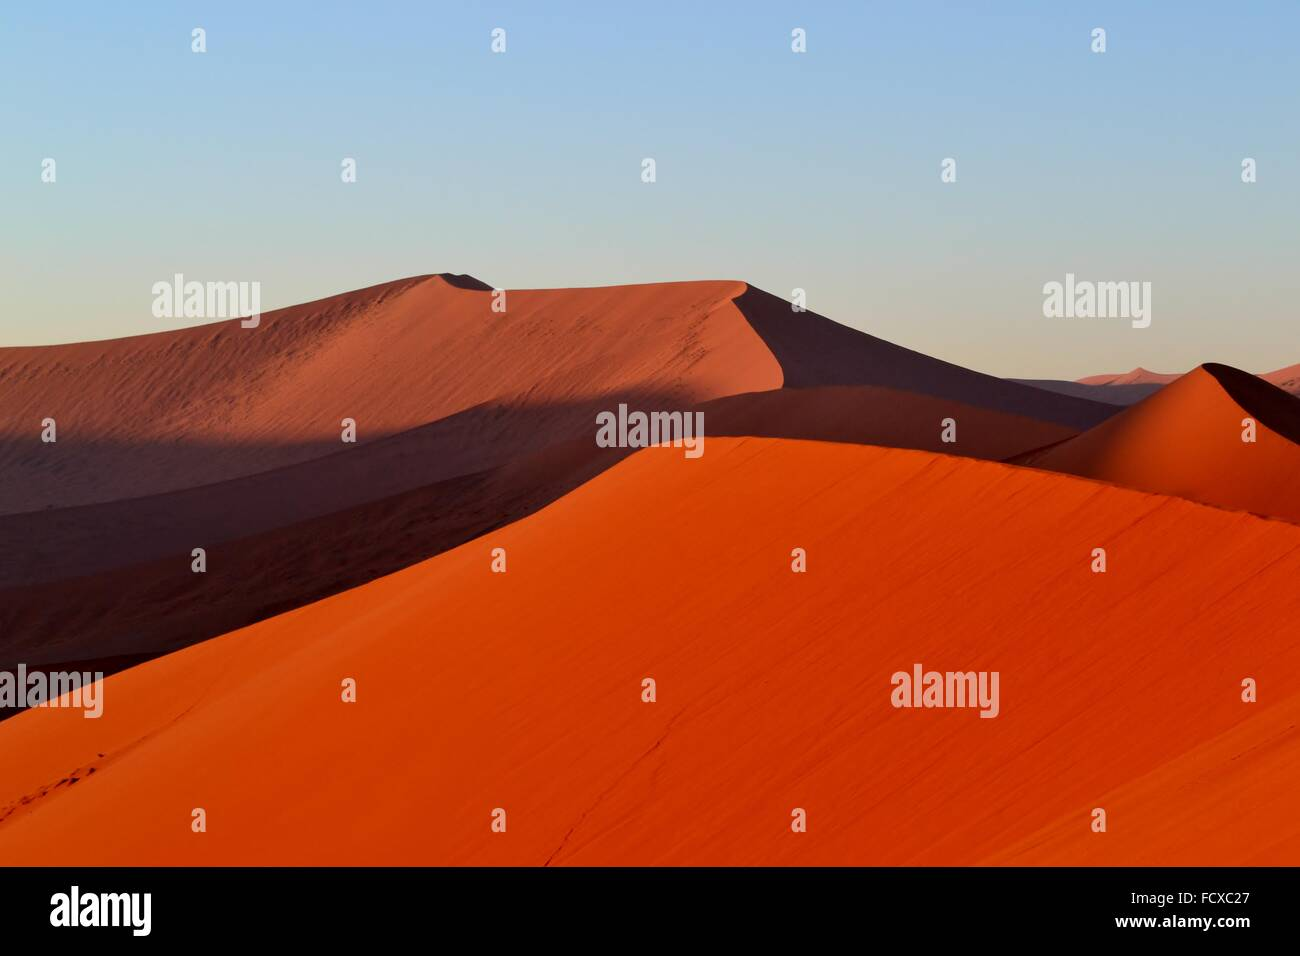 Riesige Sanddünen im Morgengrauen am Sossusvlei, Namibia, Afrika Stockbild